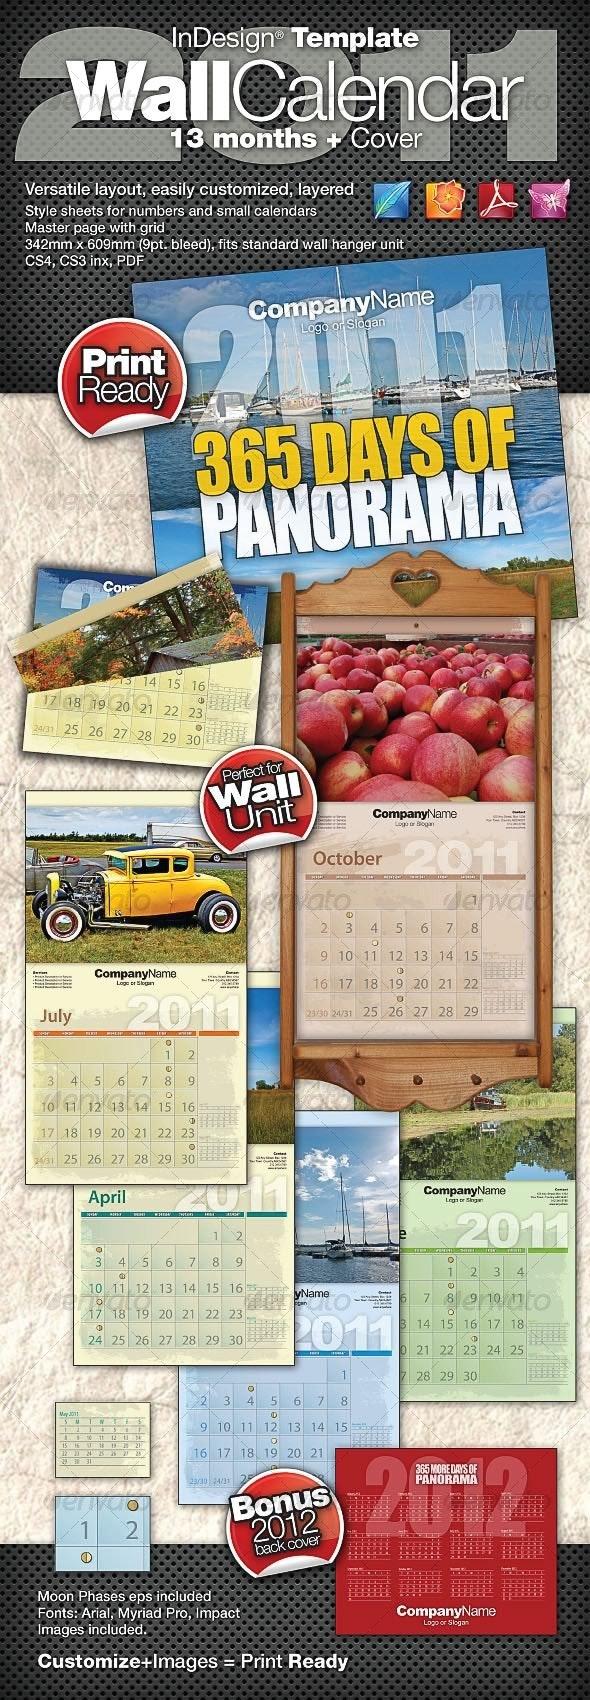 2011 Wall Calendar - 15 Months + Cover   - Calendars Stationery